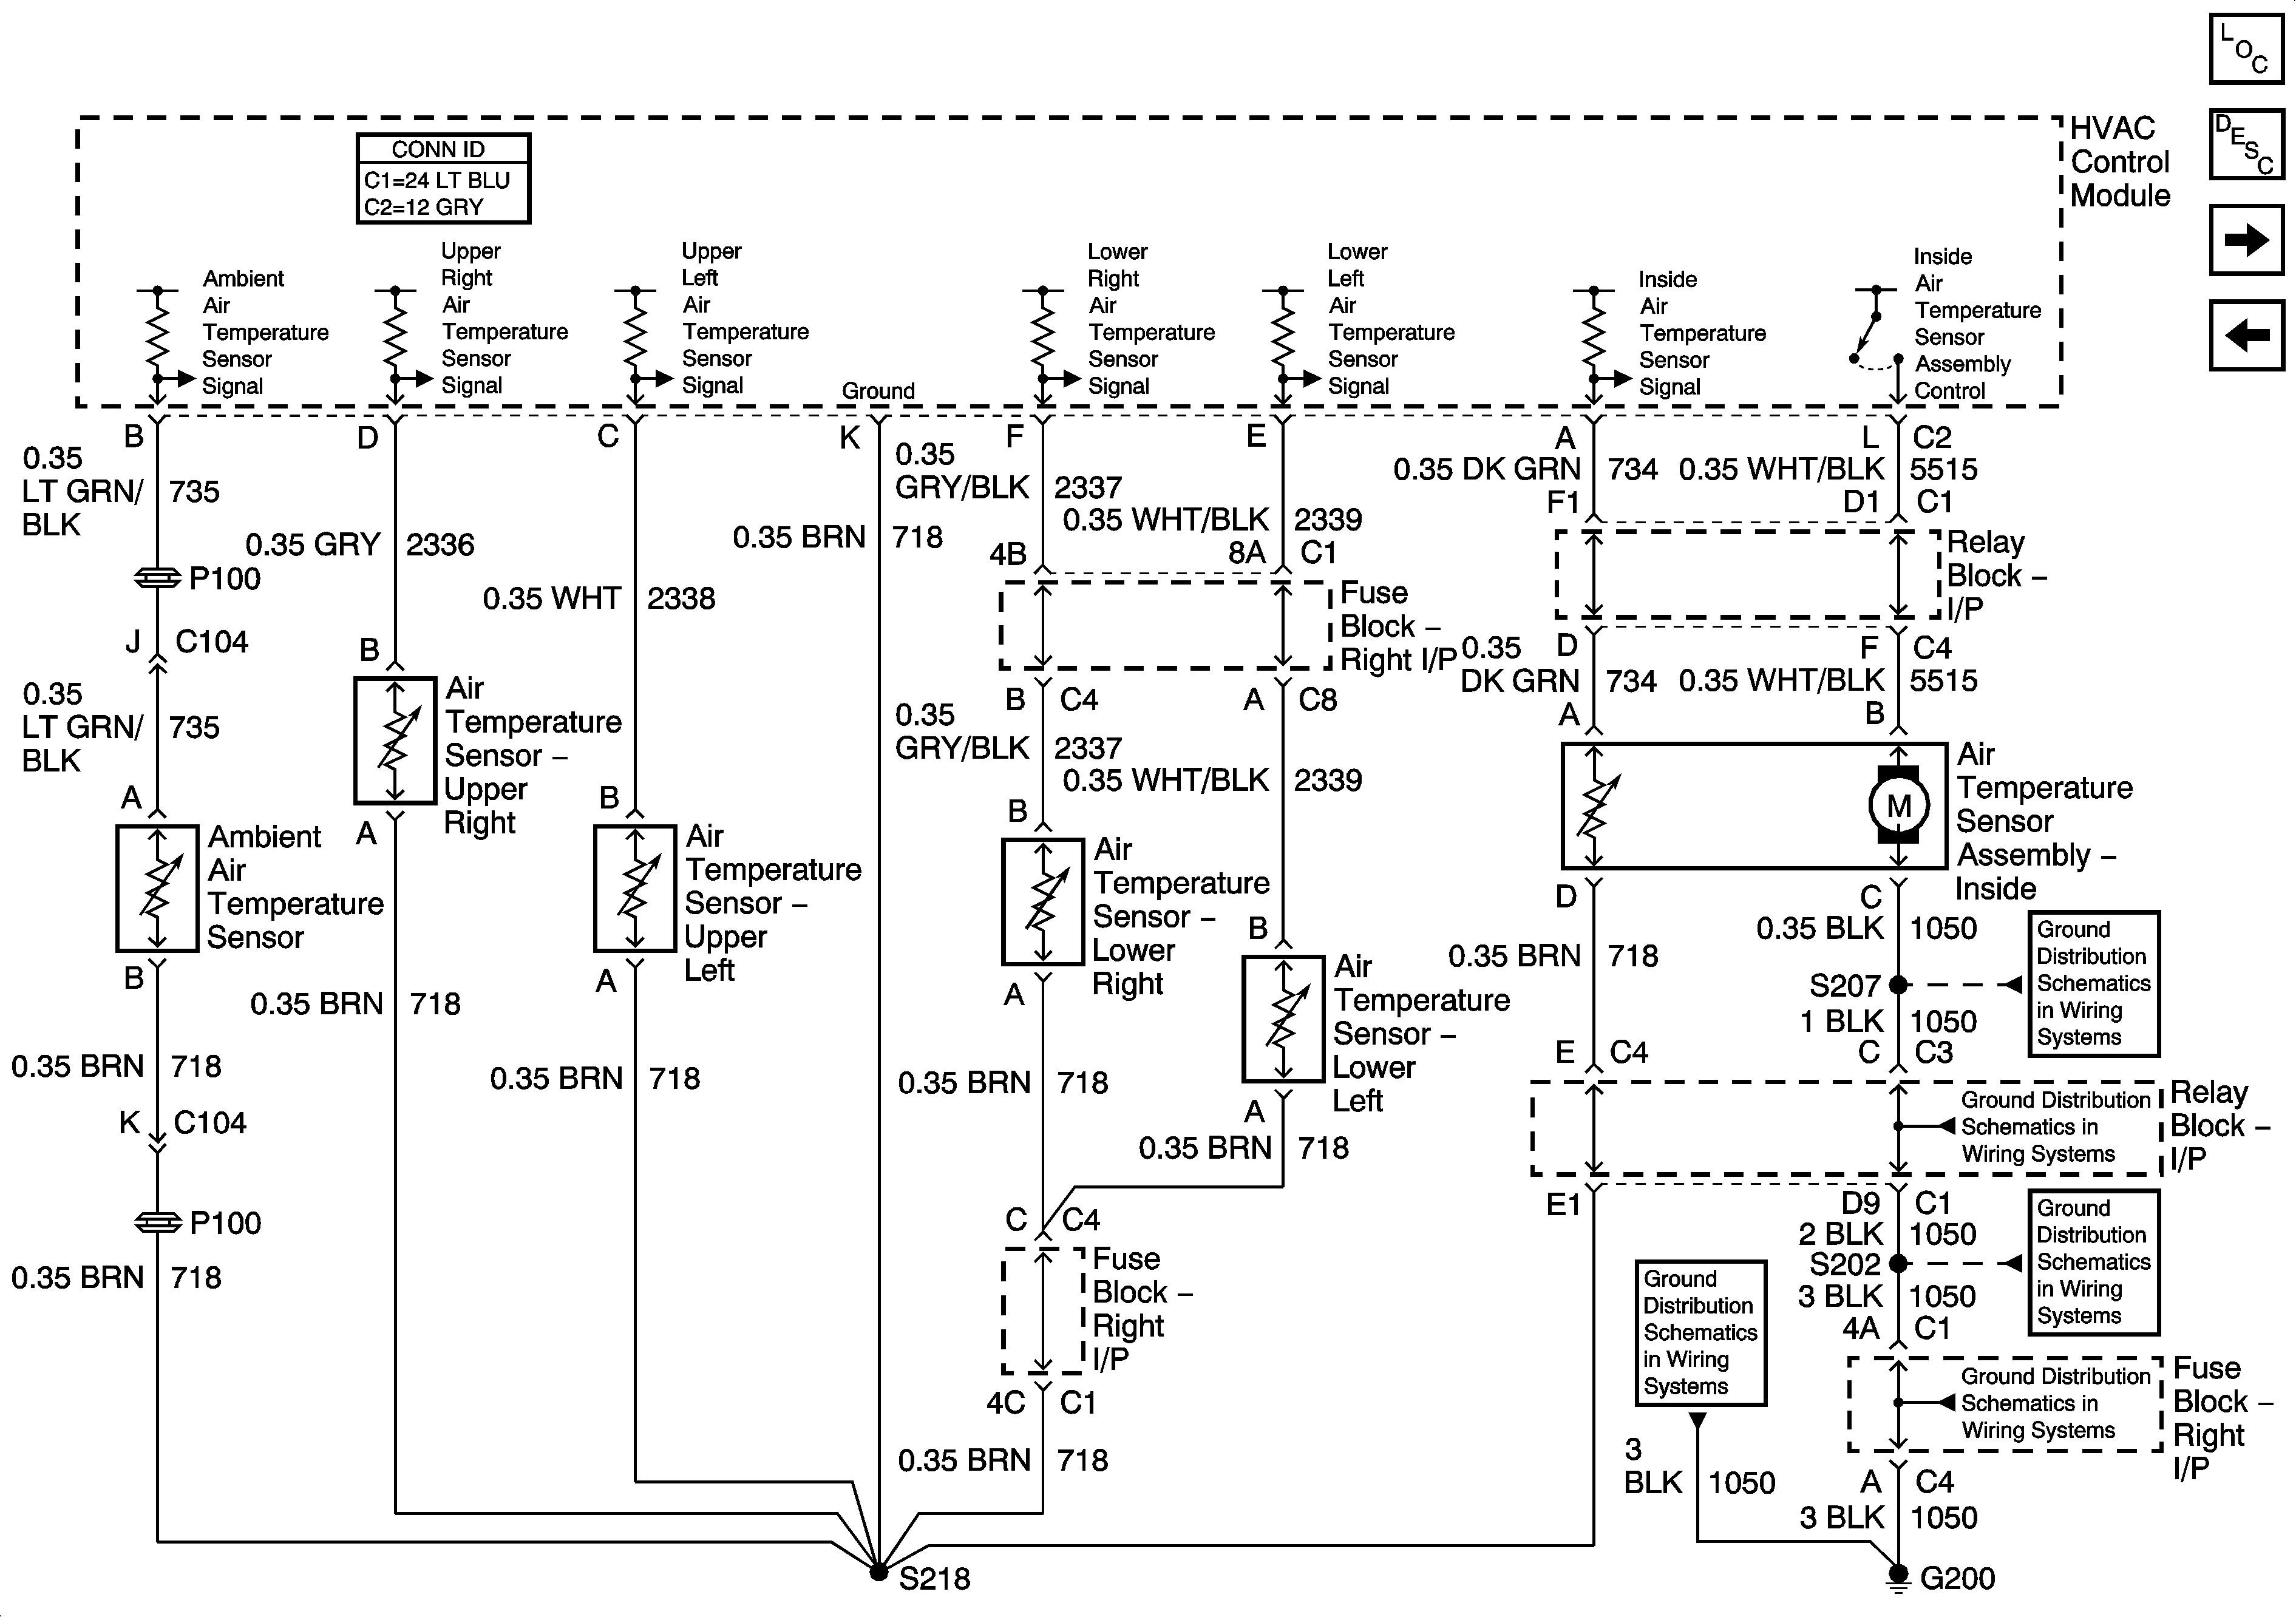 chevy equinox 2007 pnp wiring diagram 1 wiring diagram sourcepnp wiring diagram 2004 wiring diagram blog2004 tahoe pnp wiring diagram wiring diagram automotive pnp proximity